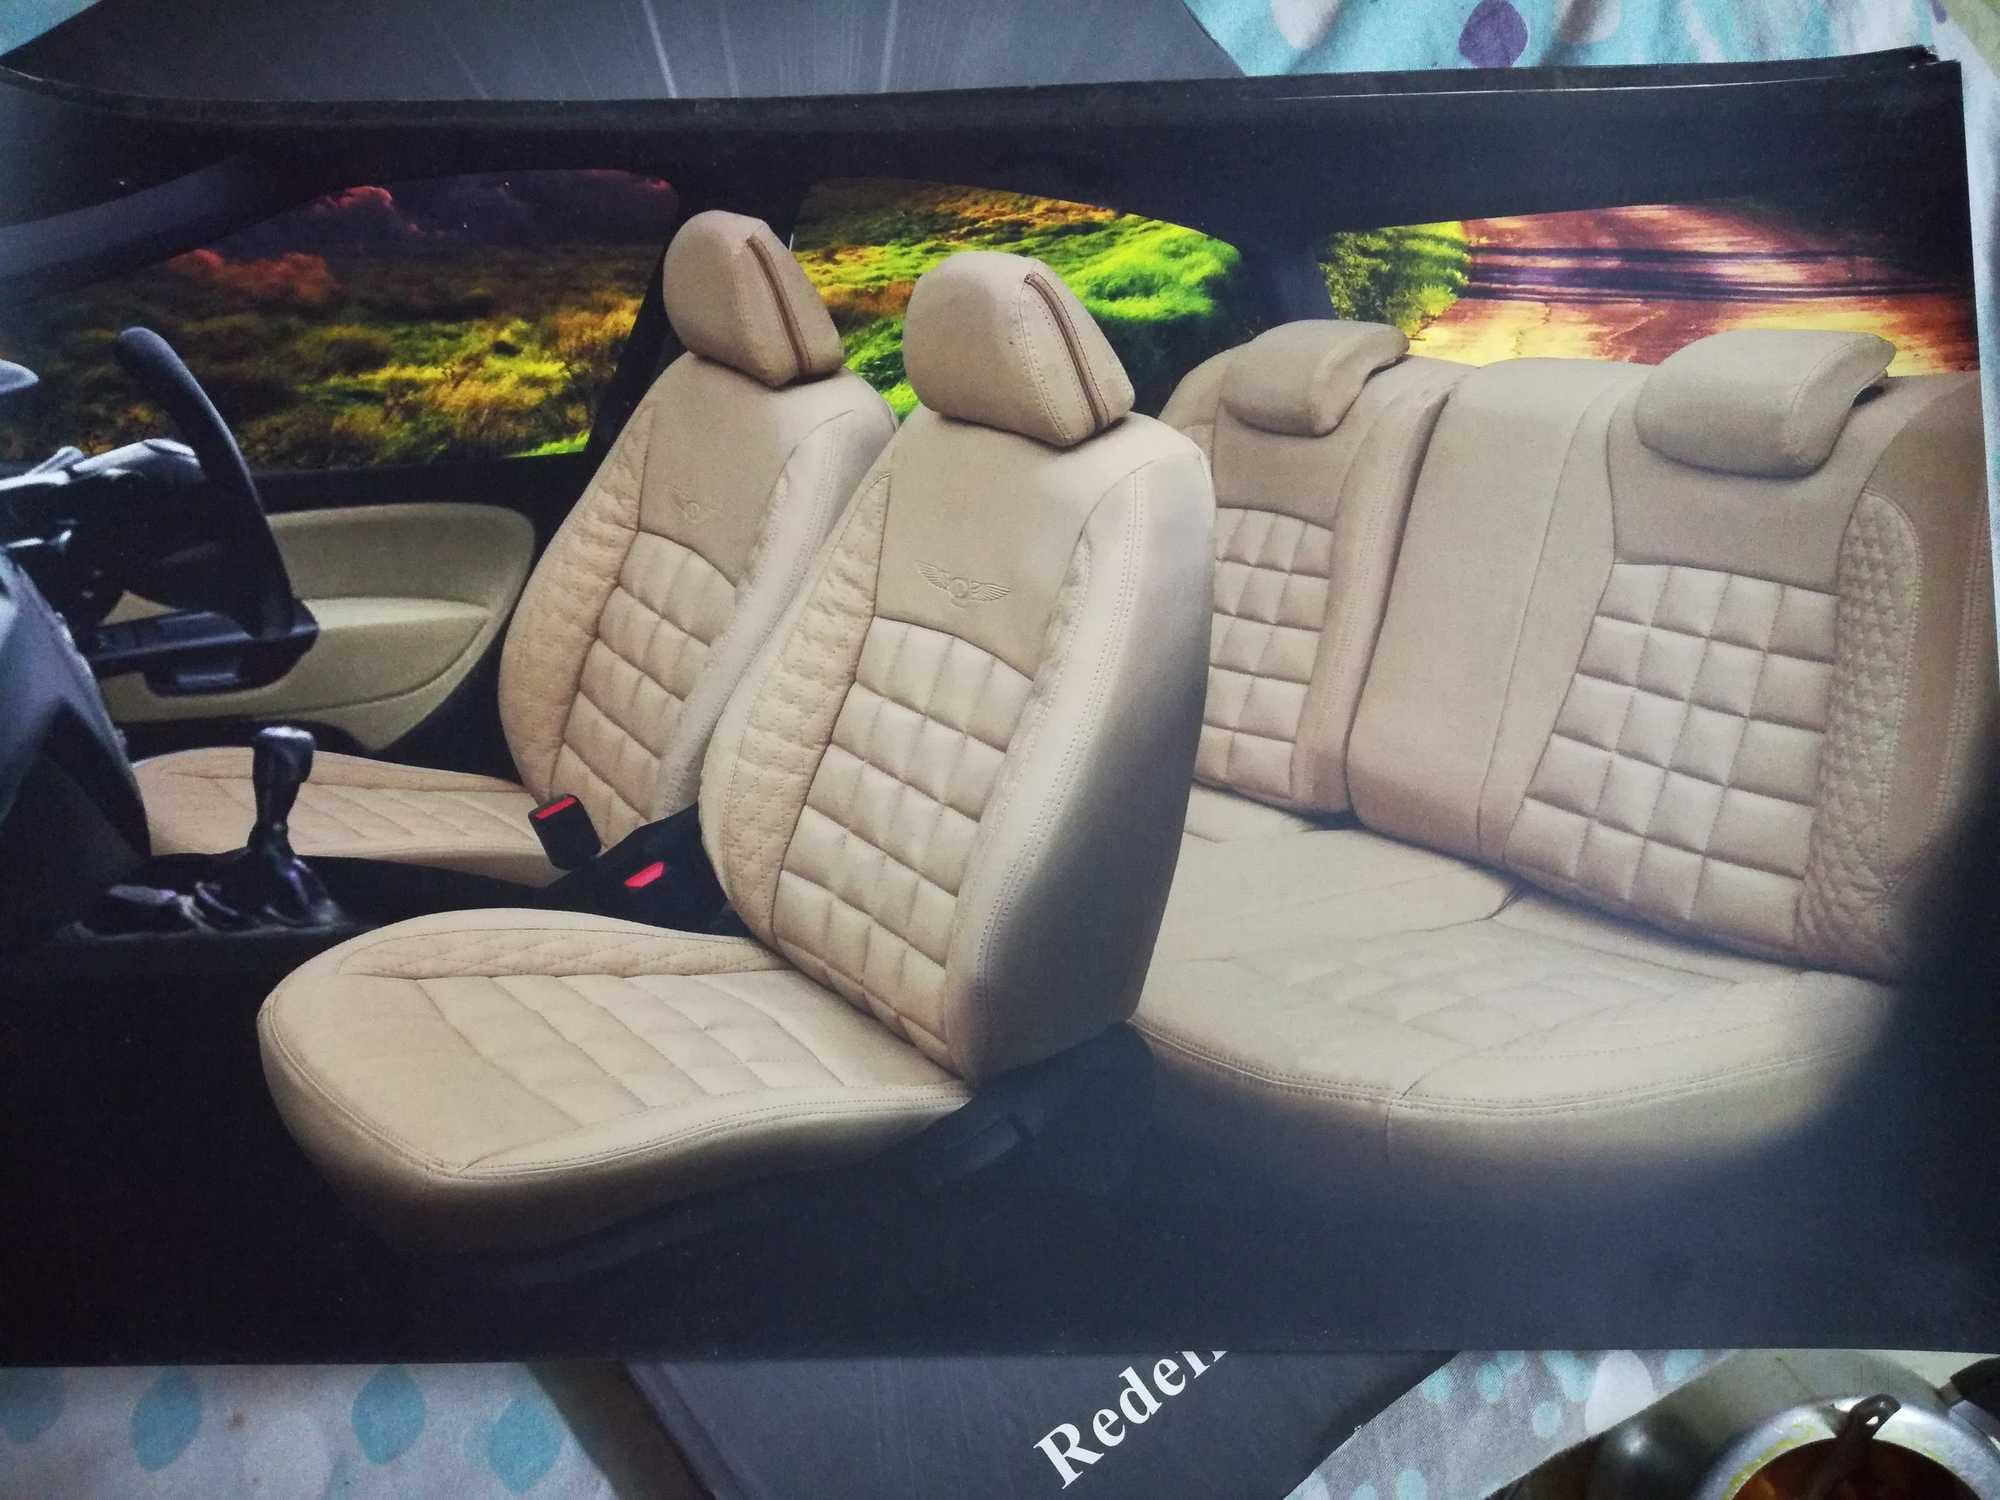 12d054b26 Top 100 Car Accessory Manufacturers in Gurgaon Sector 47